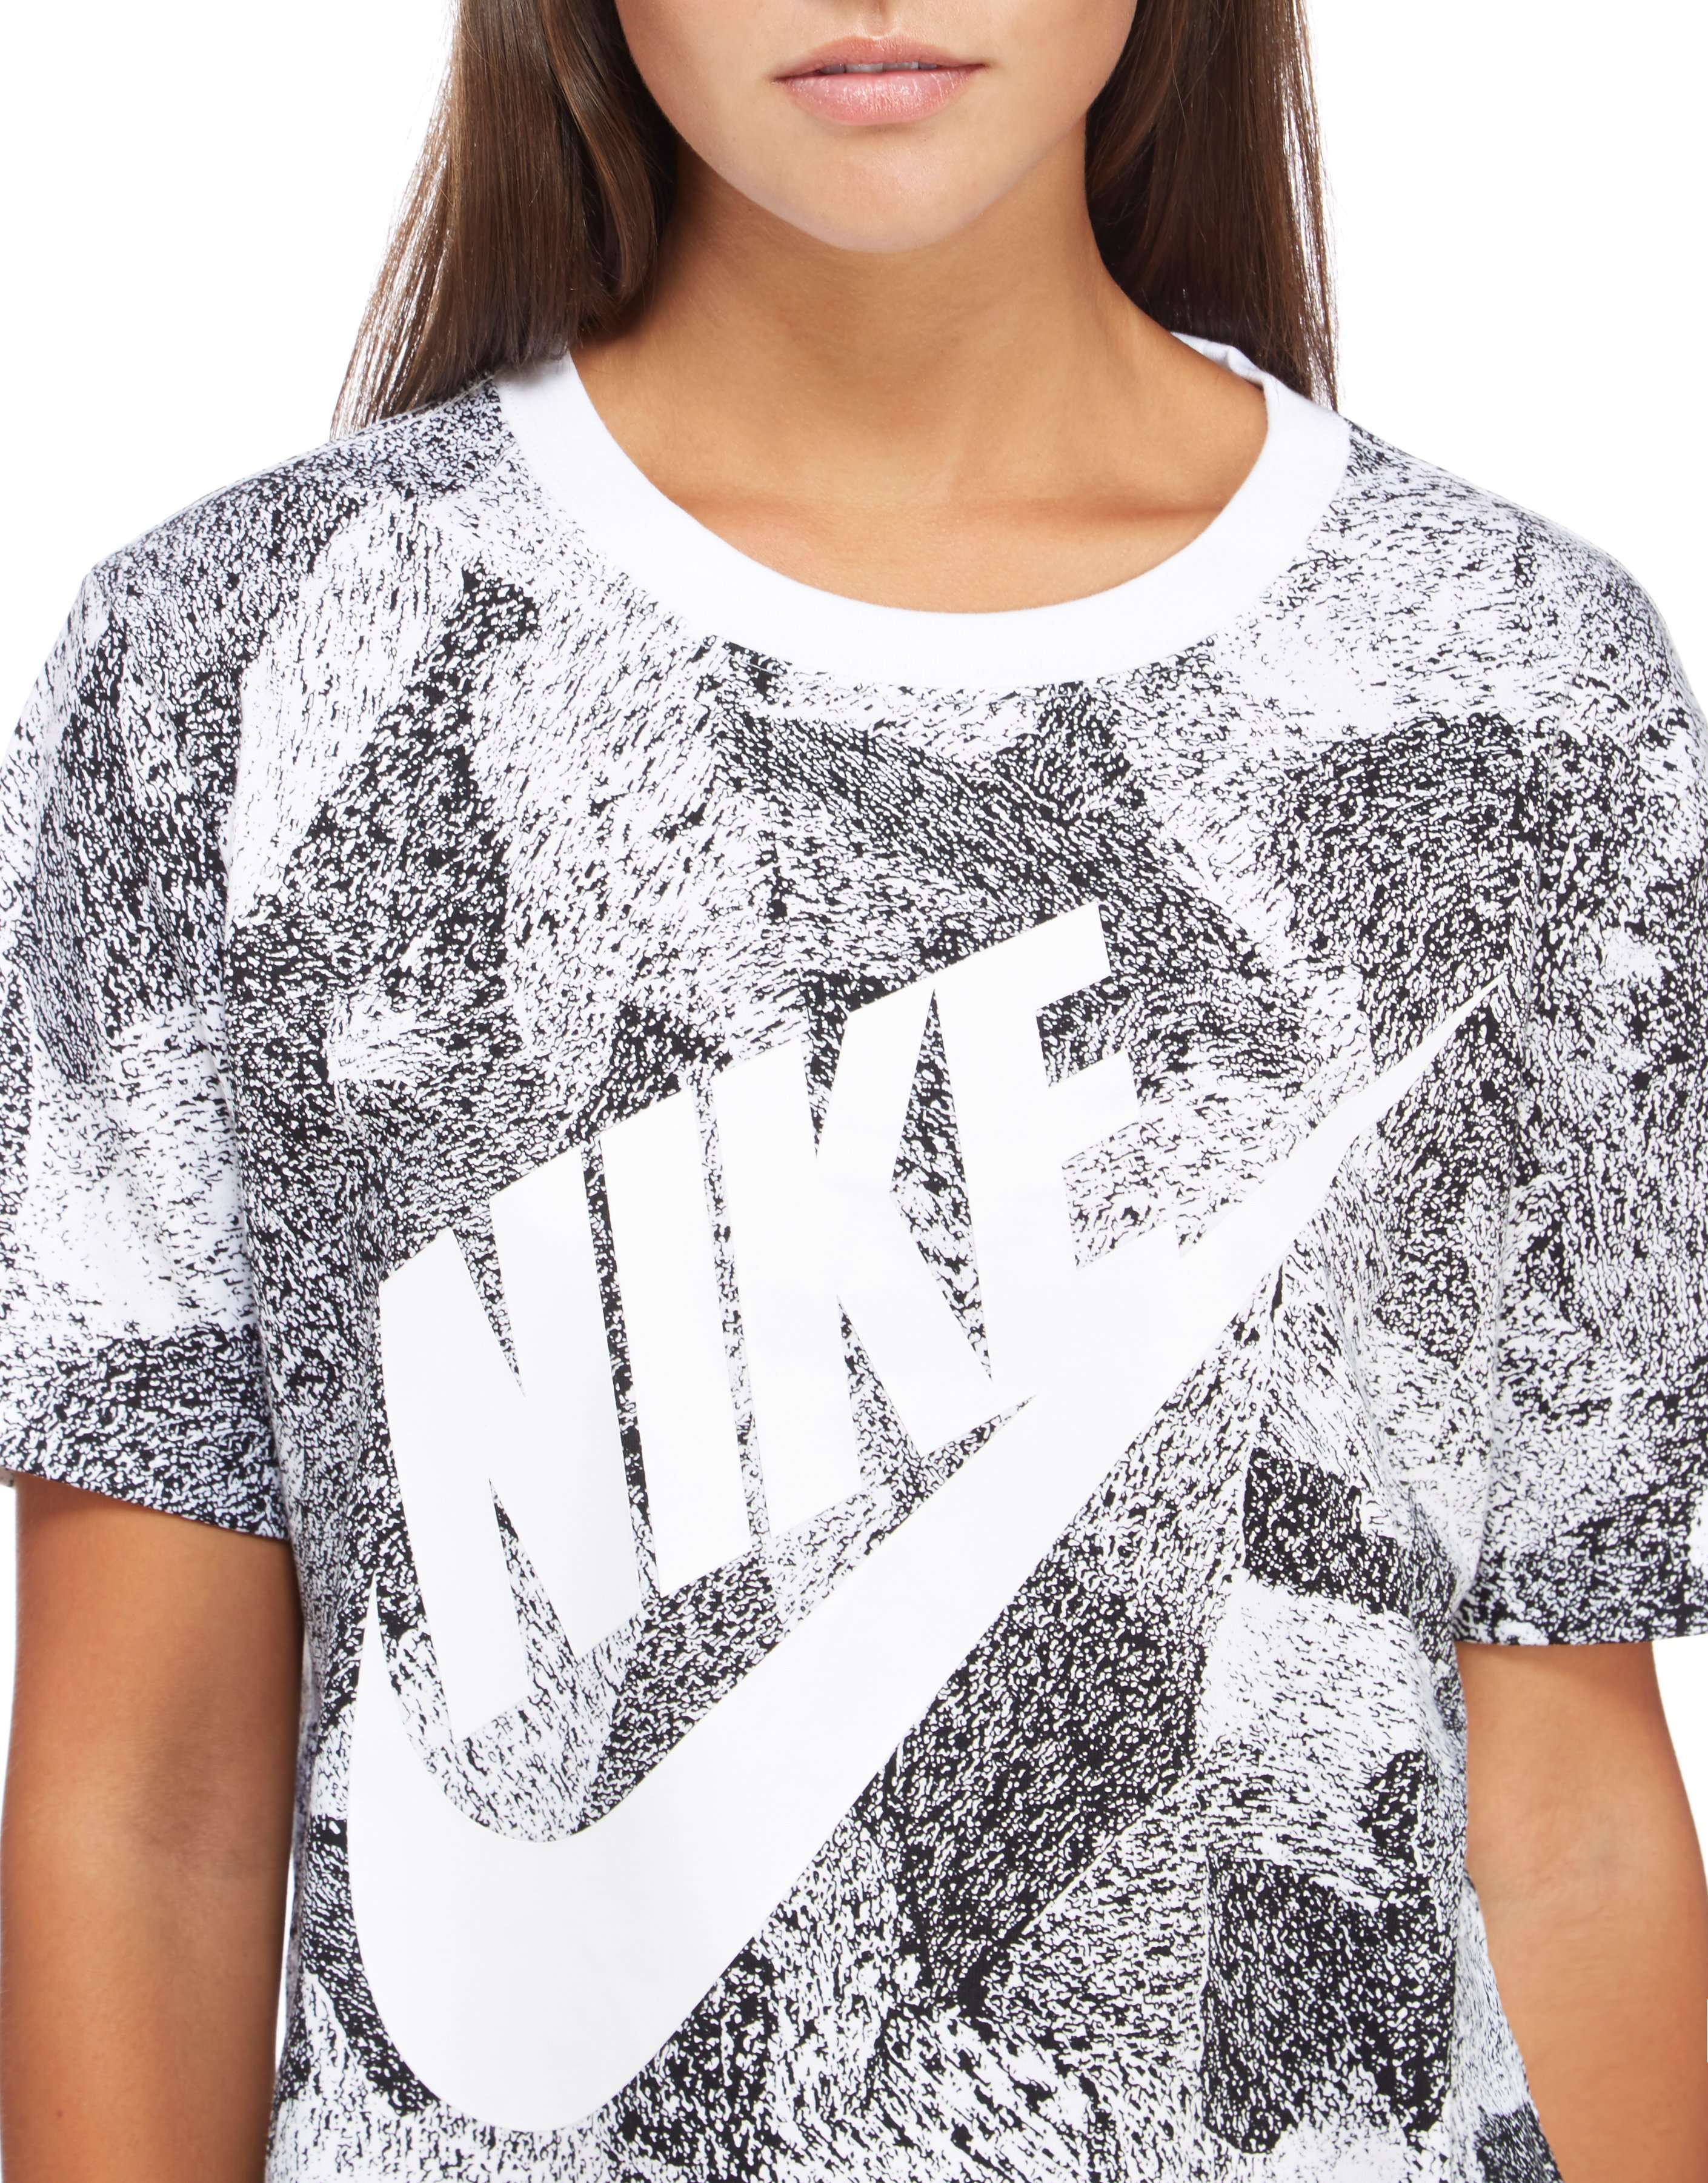 Nike Print Crop T-Shirt